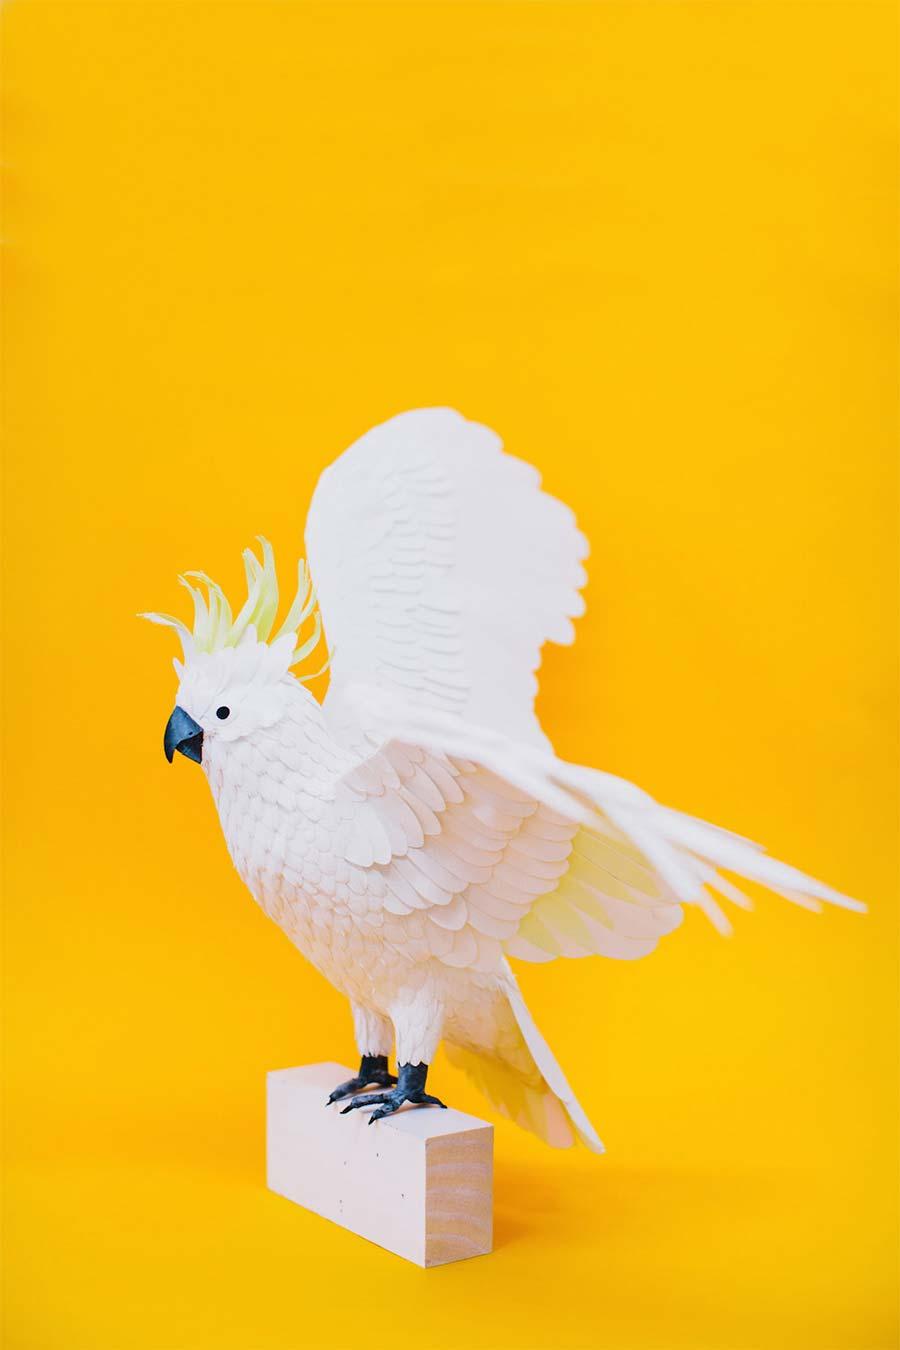 Neue Papiervögel von Diana Beltran Herrera diana-beltran-herrera-2_06